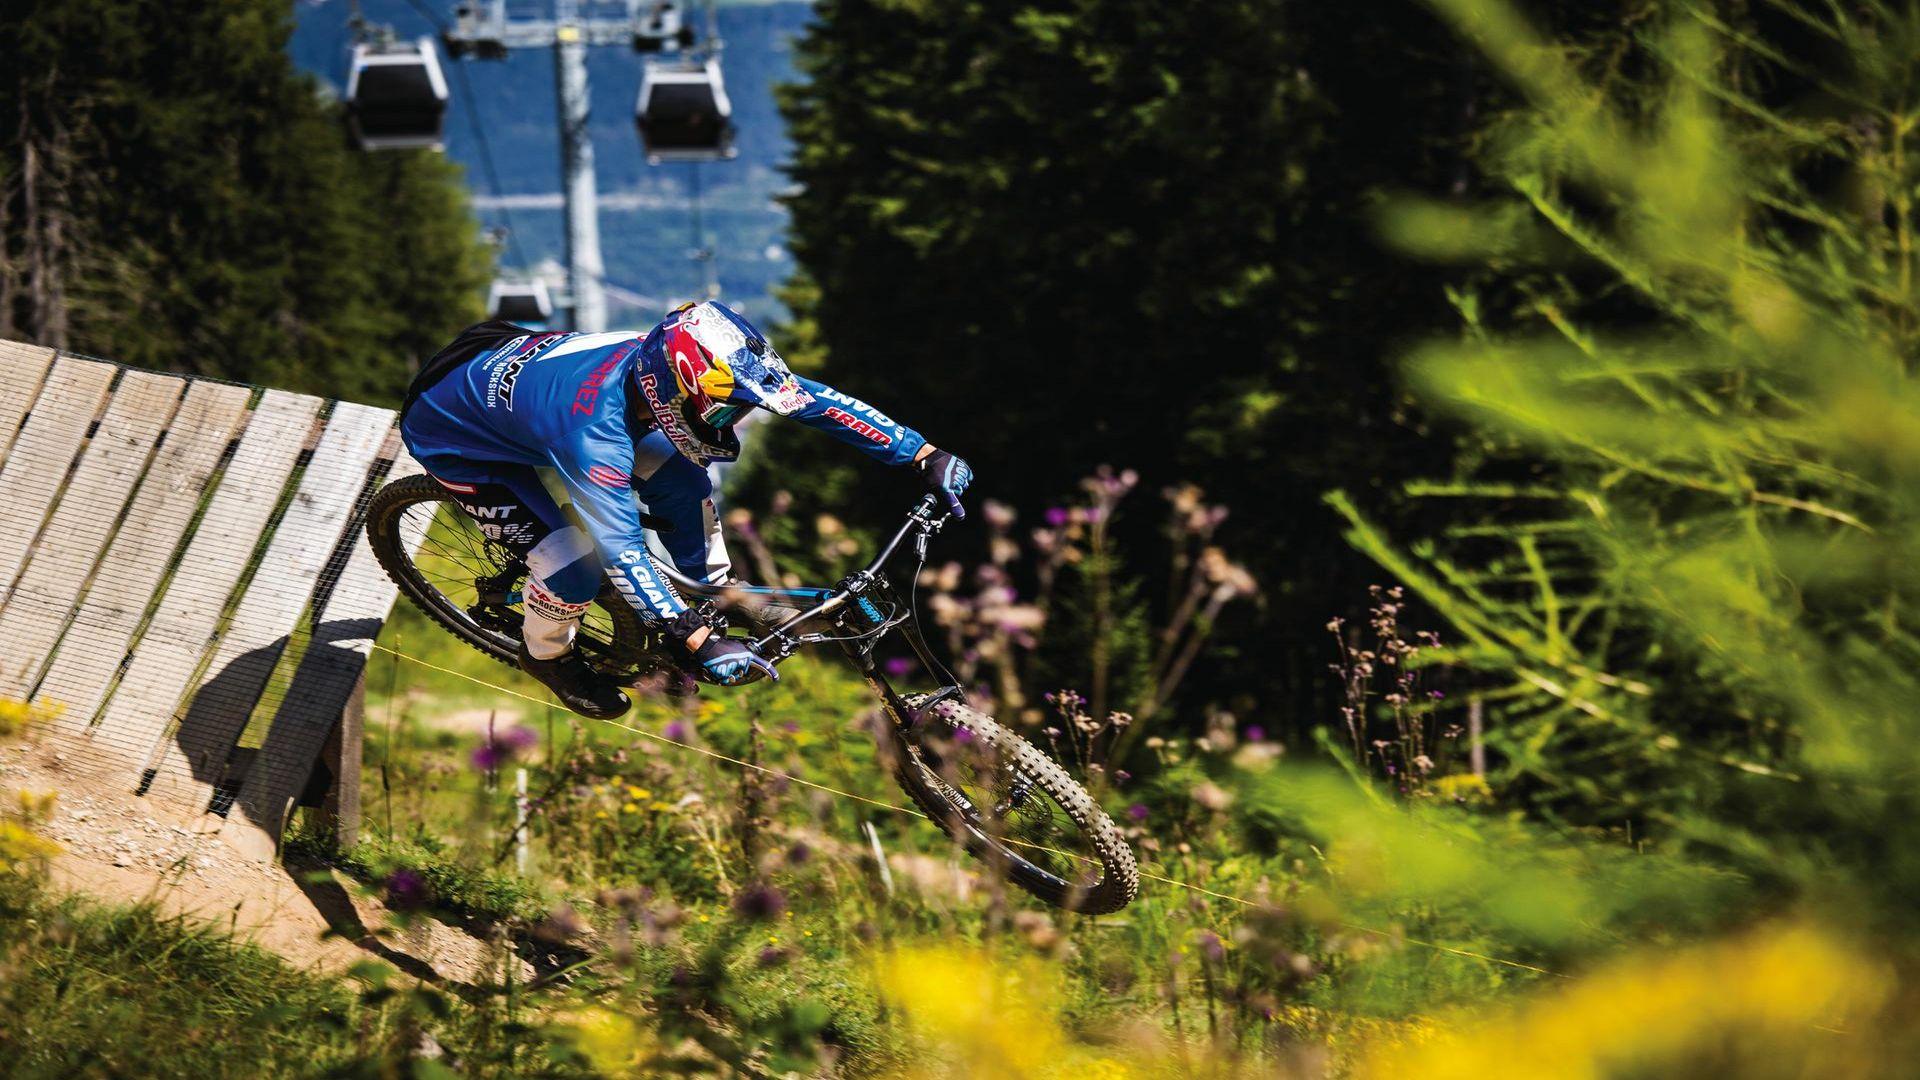 Bikepark de Innsbruck